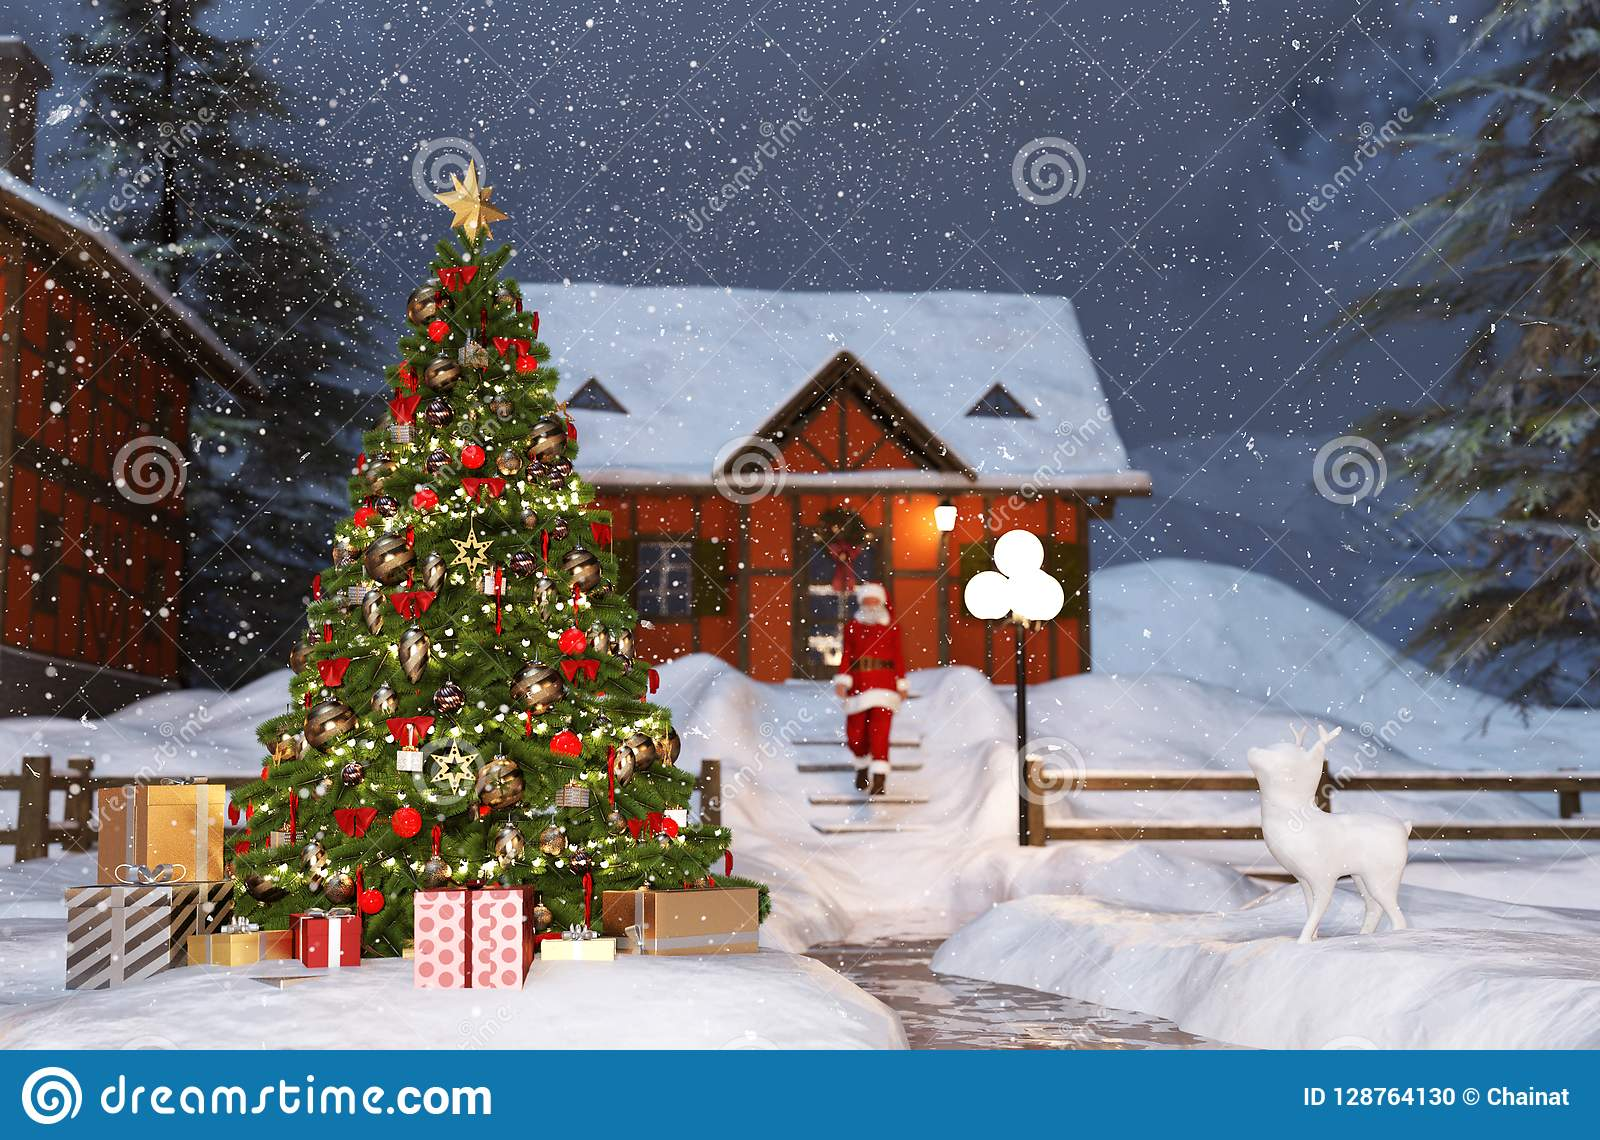 Scene Of Christmas Tree In Winter Village Stock Illustration Illustration Of Magic Ball 128764130